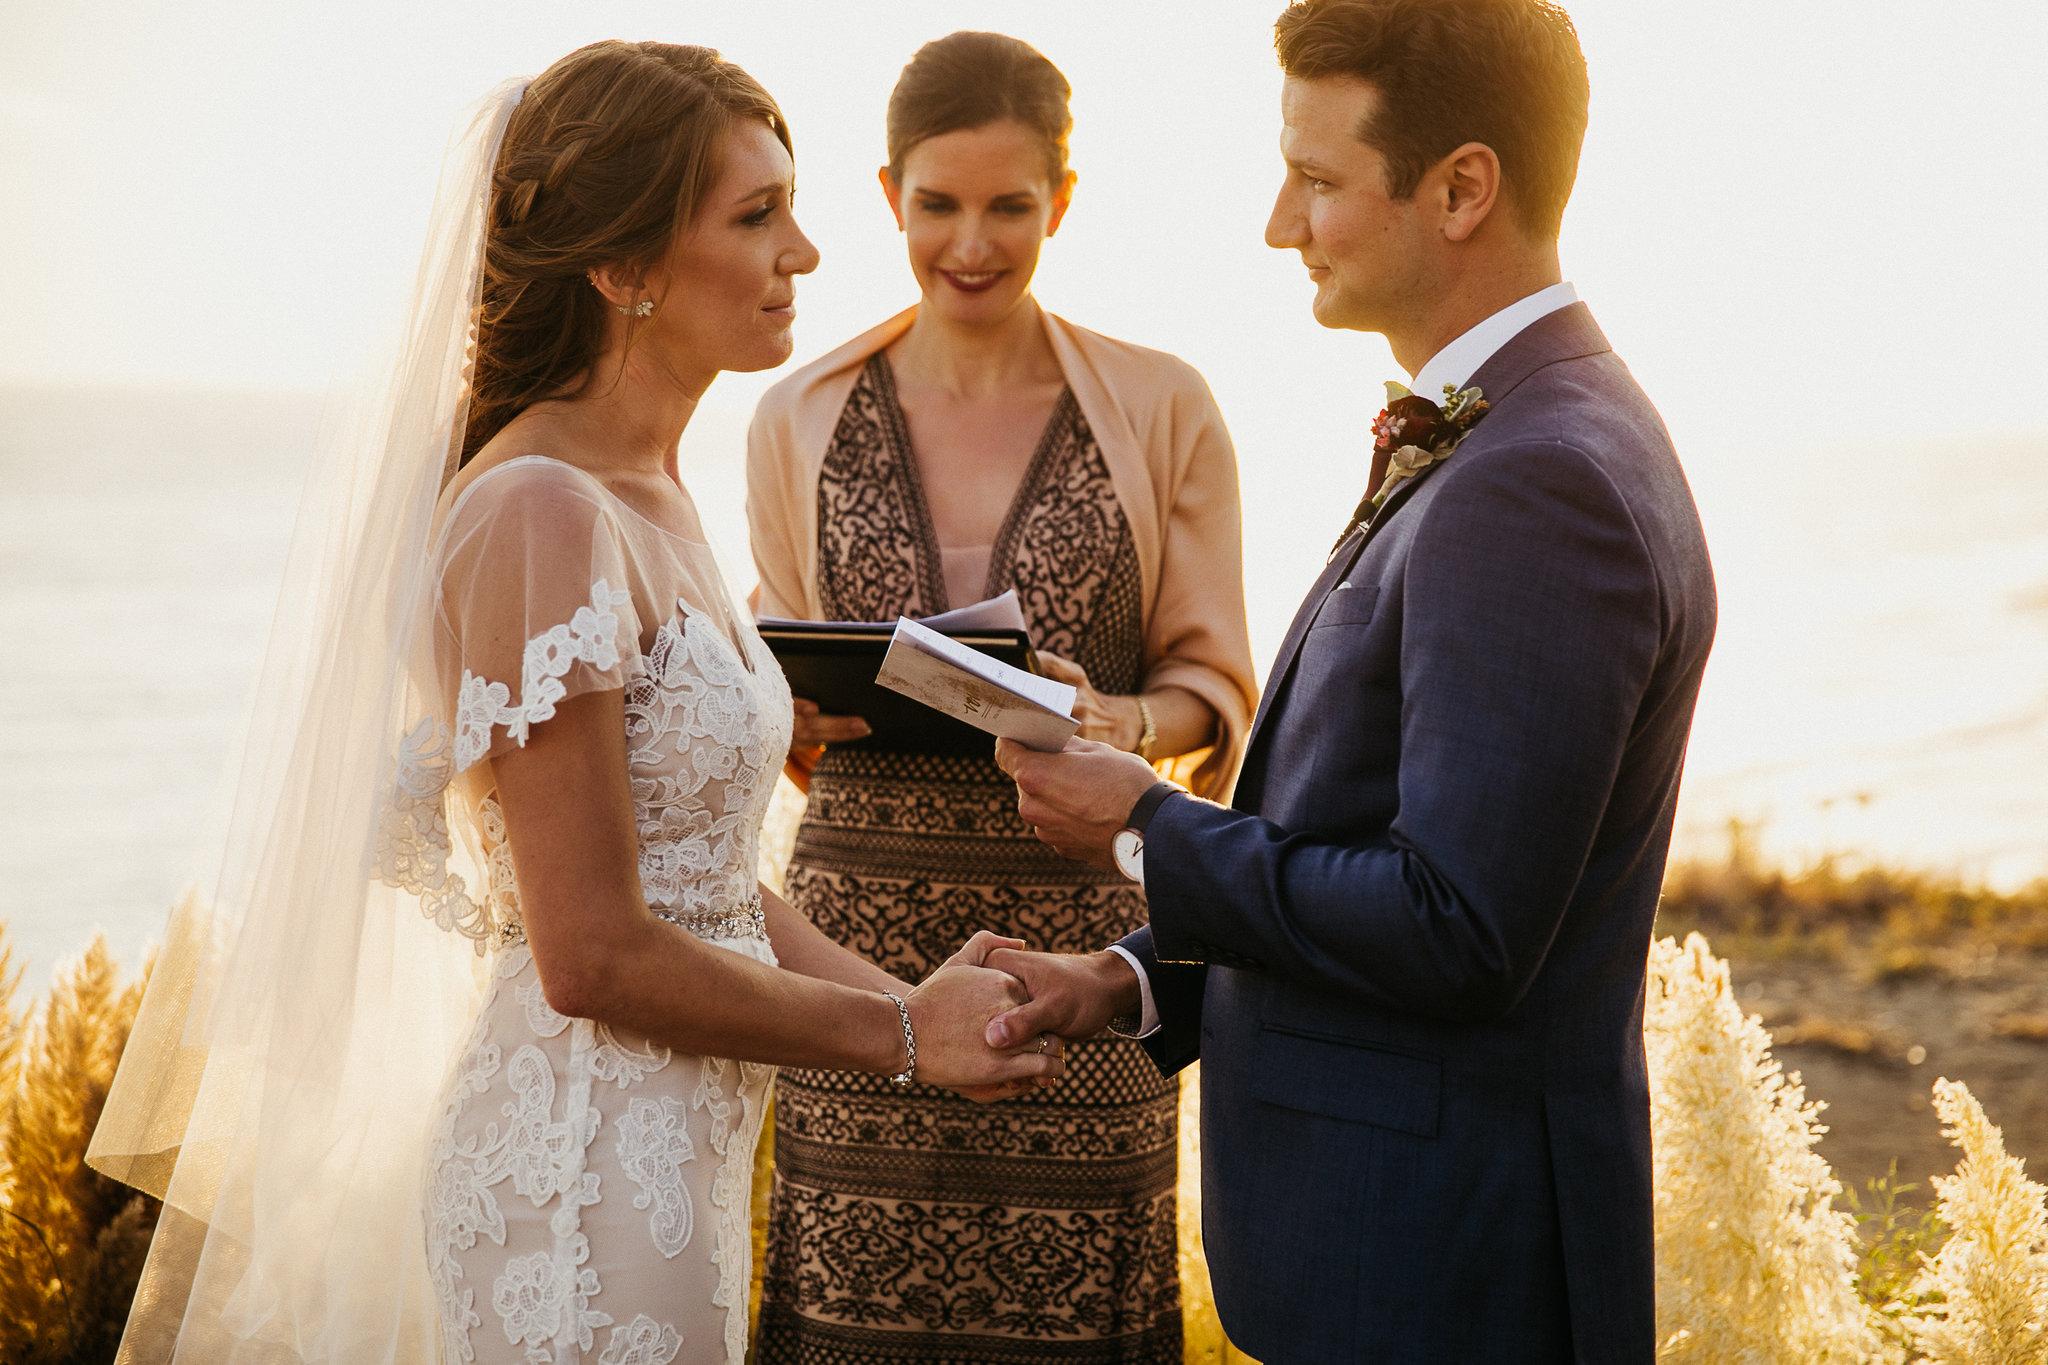 santa-barbara-elopement-wedding-planner-planning-coordinator-day-of-ellwood-bluff-ocean-front-view-bacara-resort-ritz-carlton-porsche-downtown (24).jpg